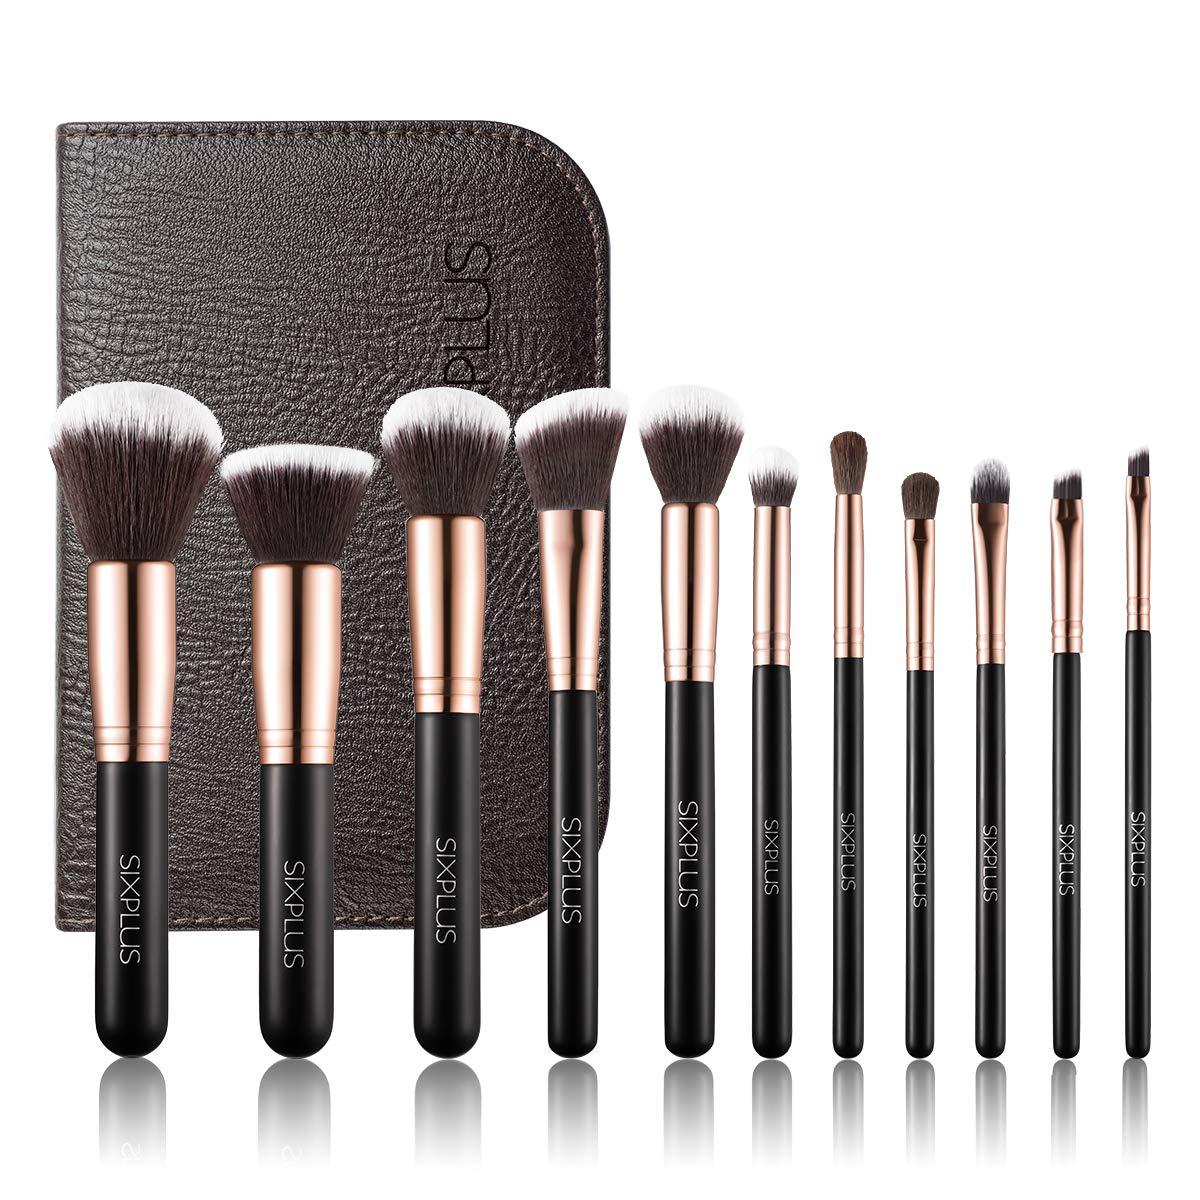 SIXPLUS 11pcs Makeup Brushes with Case Premium Synthetic Professional Makeup Brush Set(royal golden)